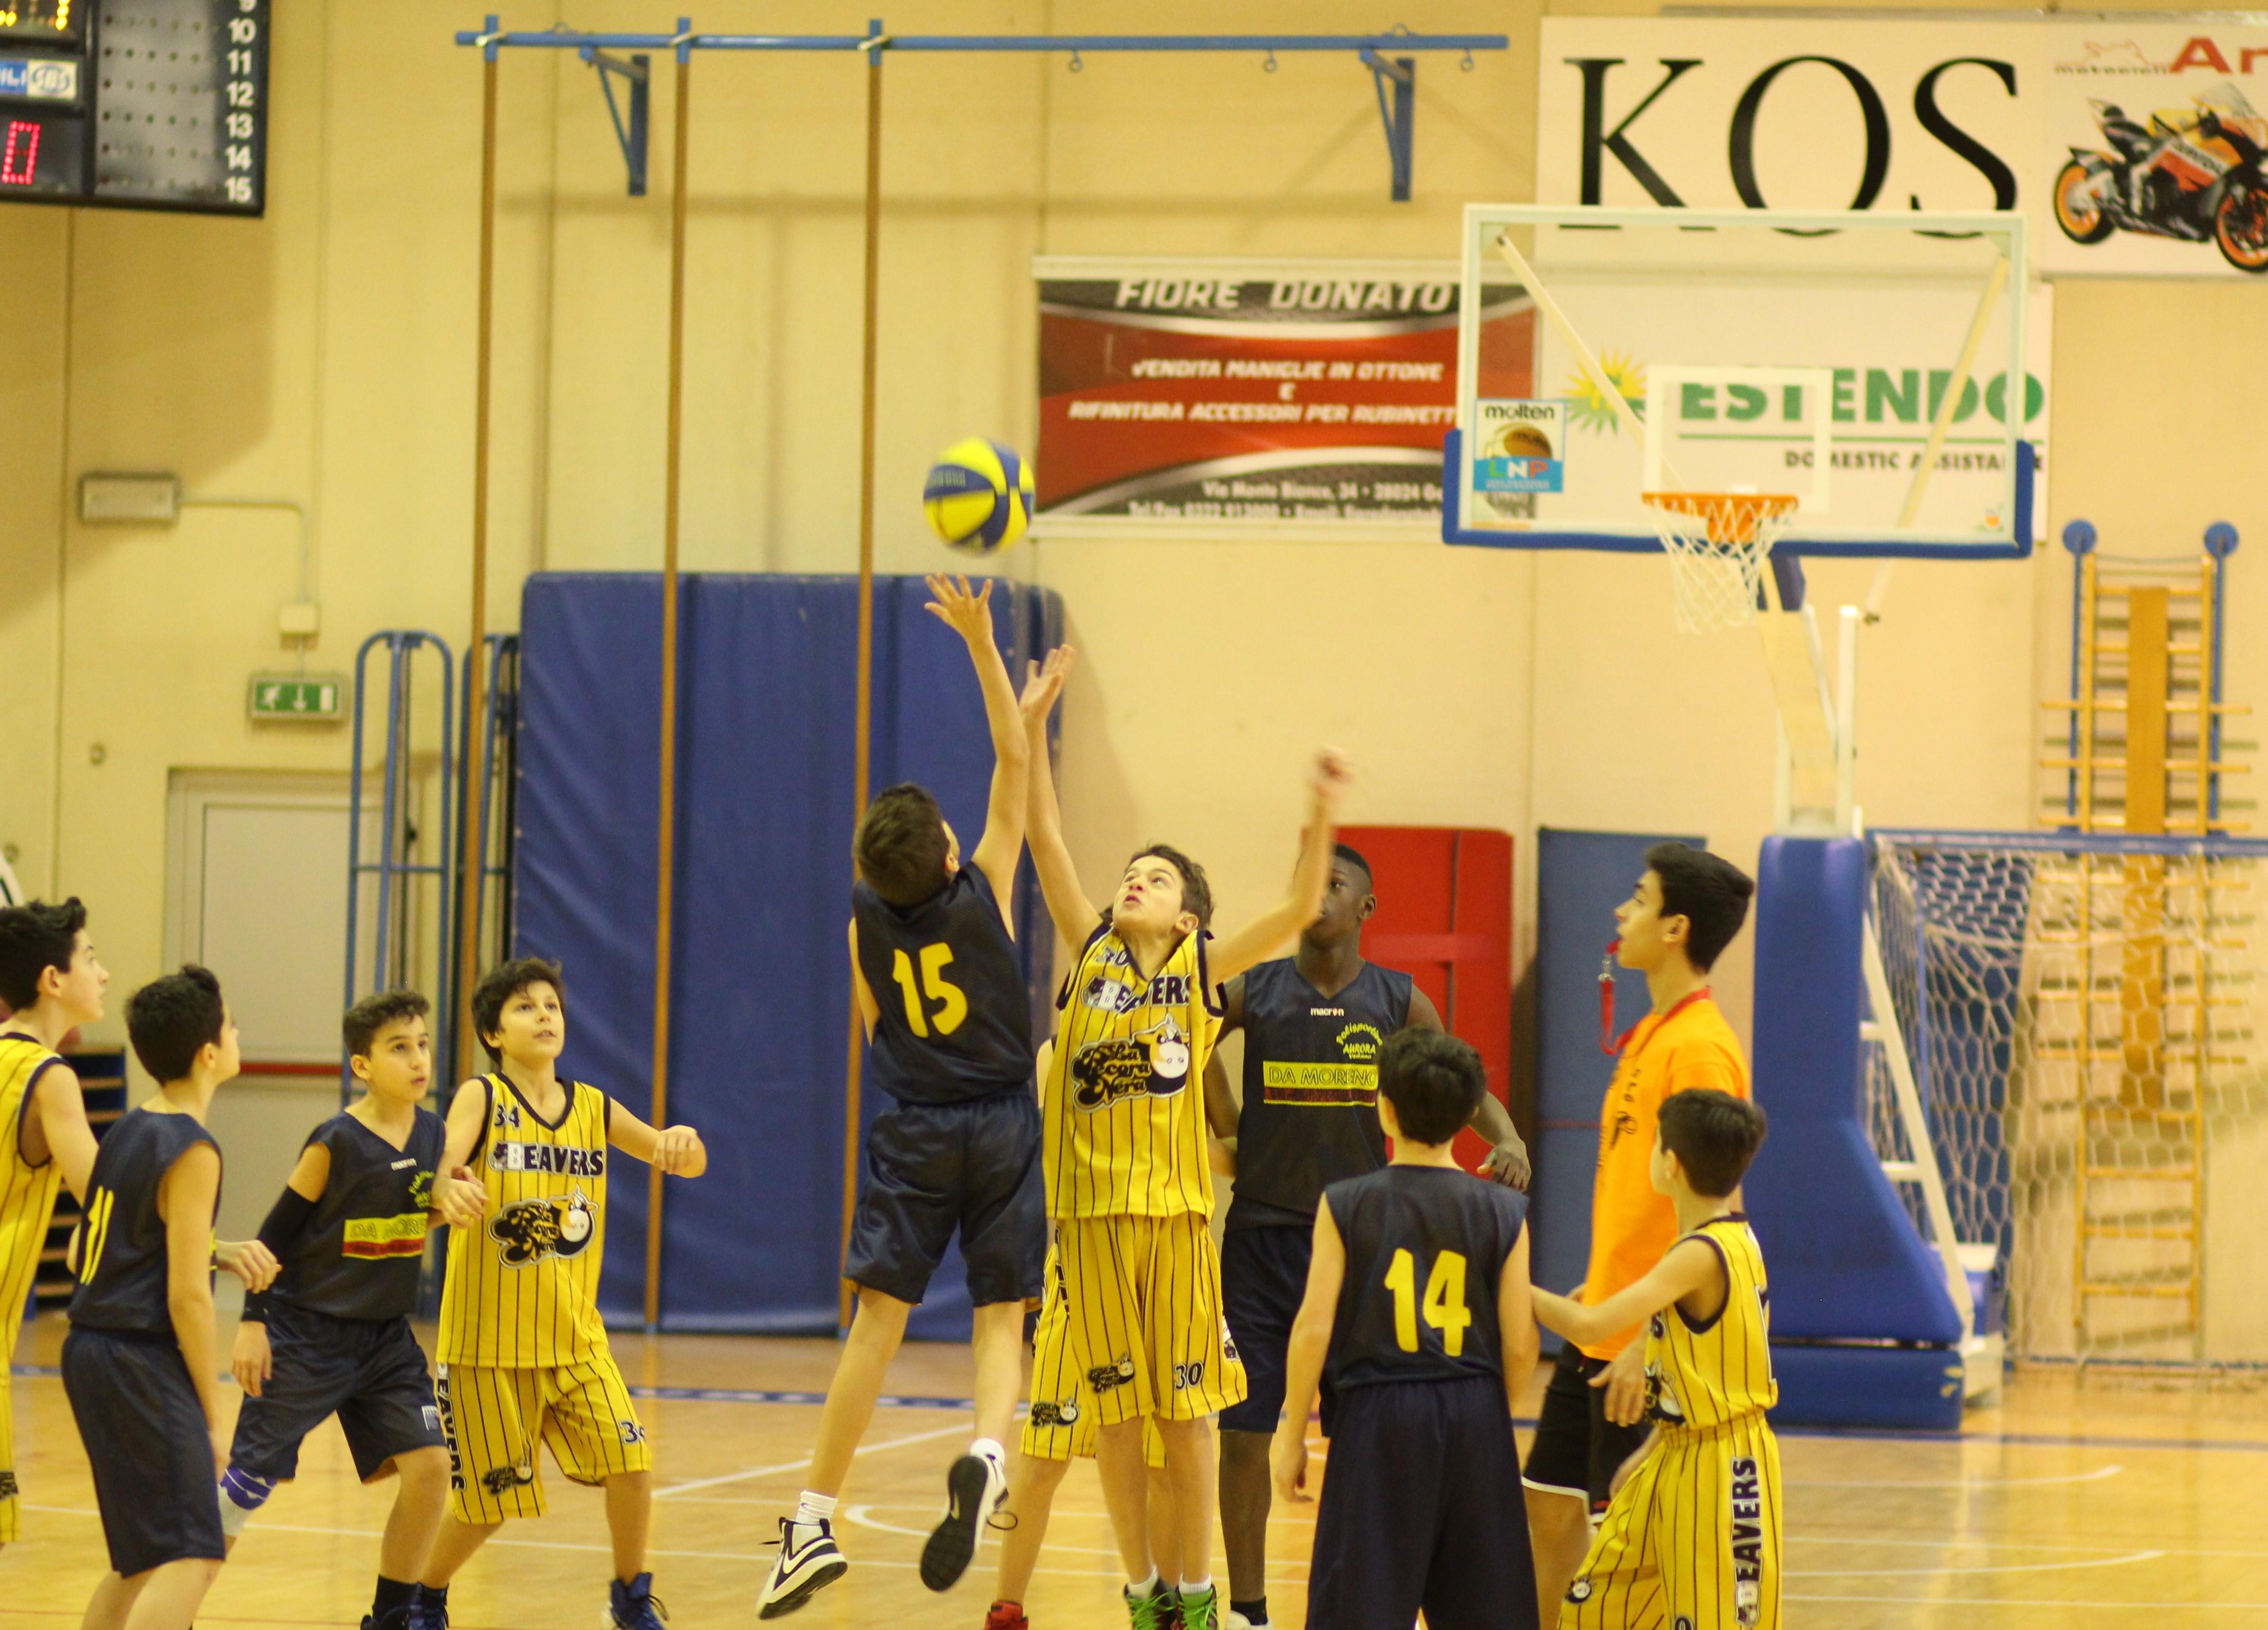 Minibasket borgomanero beavers m2w sport associazione sportiva basket novara don bosco